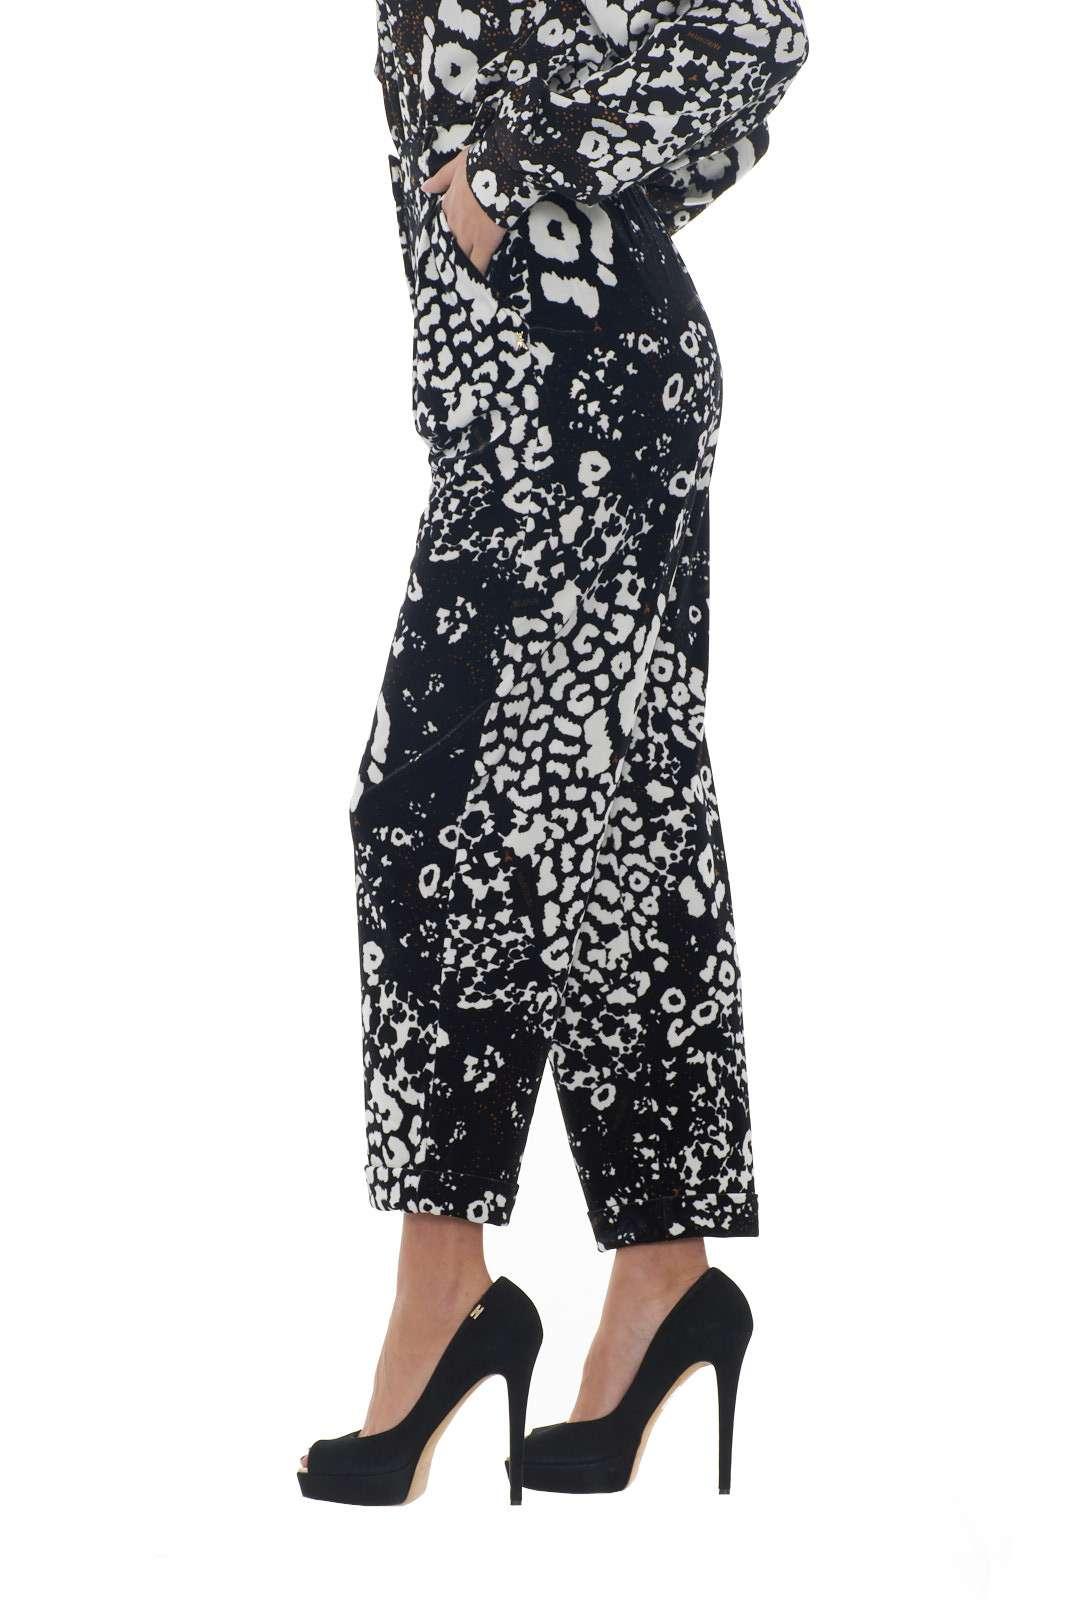 https://www.parmax.com/media/catalog/product/a/i/AI-outlet_parmax-pantaloni-donna-Patrizia-Pepe-2p1179-B.jpg